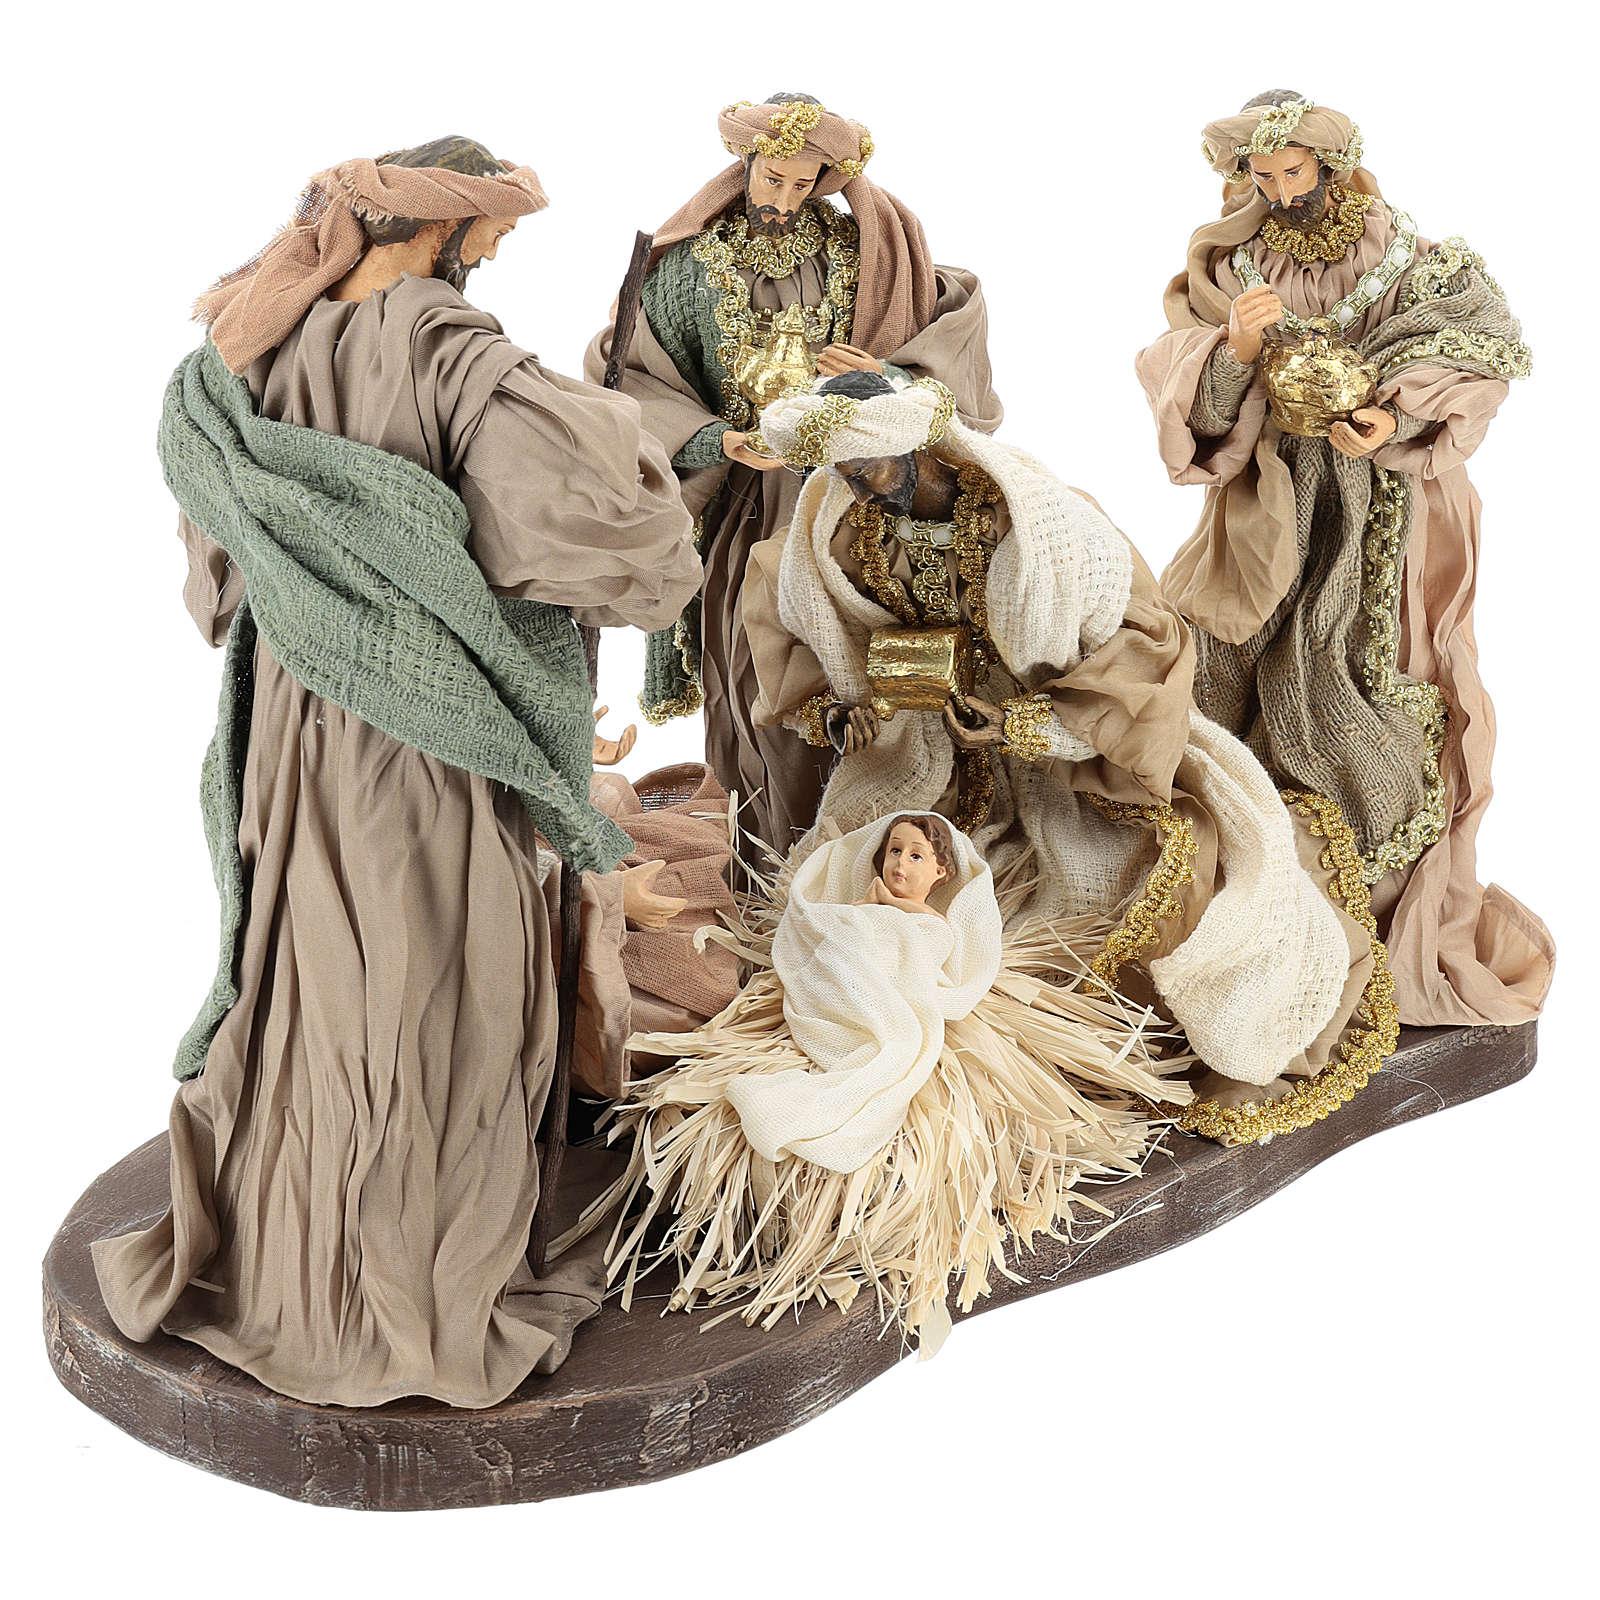 Nativity 30 cm Shabby Chic style in terracotta on 40 base diameter  3